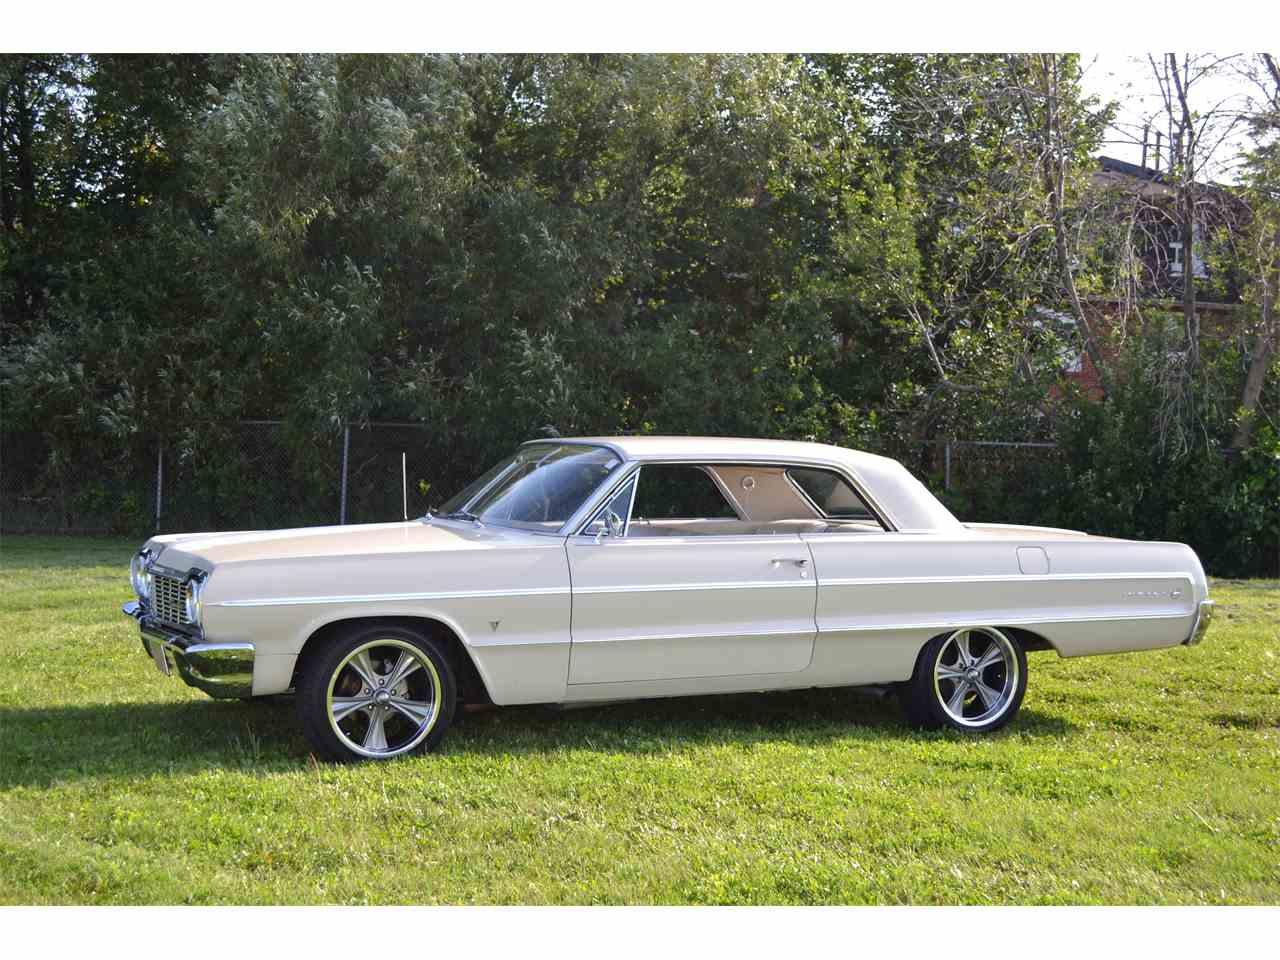 Car That Runs On Air >> 1964 Chevrolet Impala for Sale | ClassicCars.com | CC-1017158